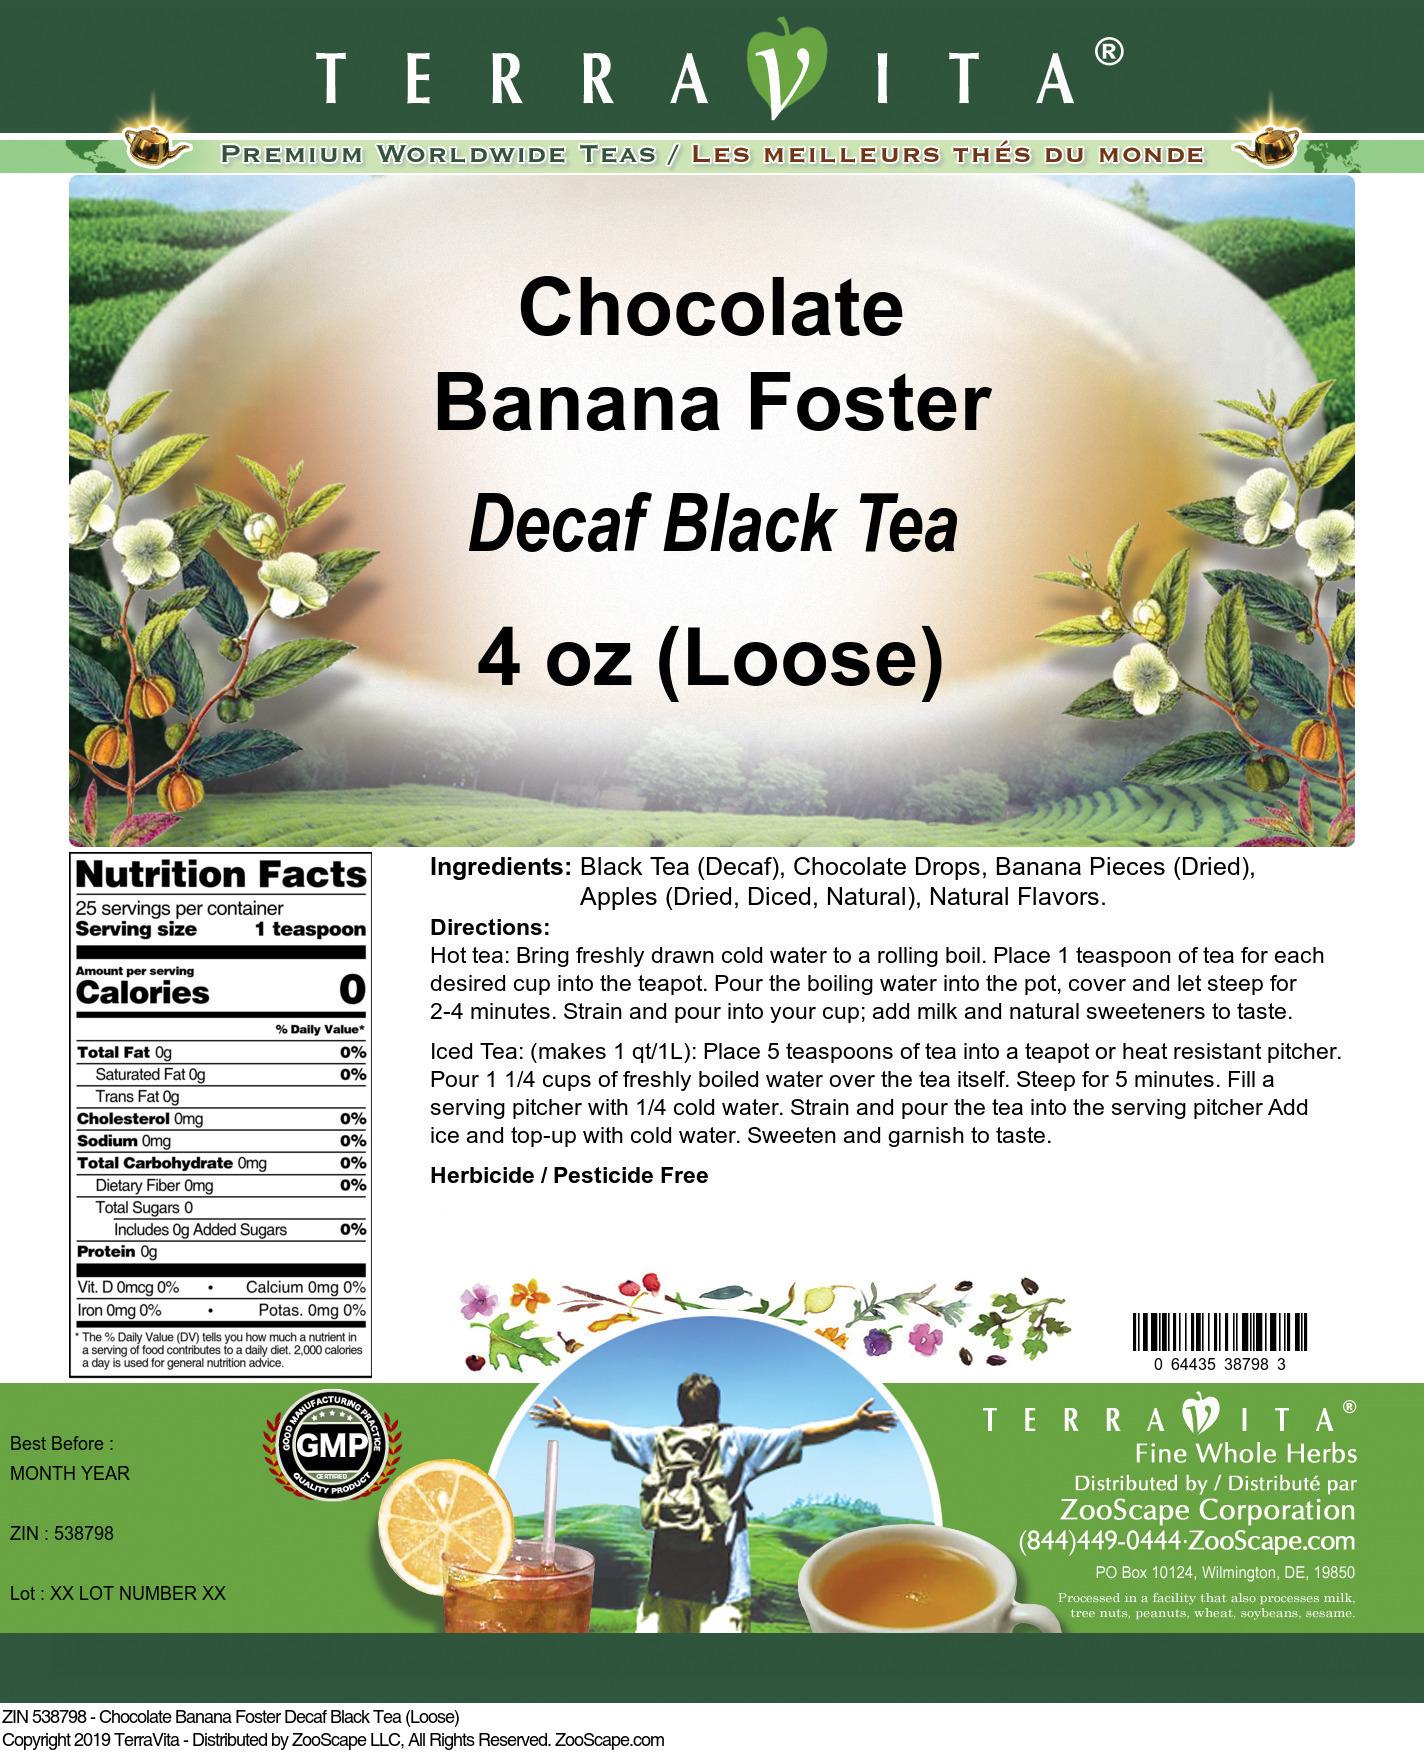 Chocolate Banana Foster Decaf Black Tea (Loose)